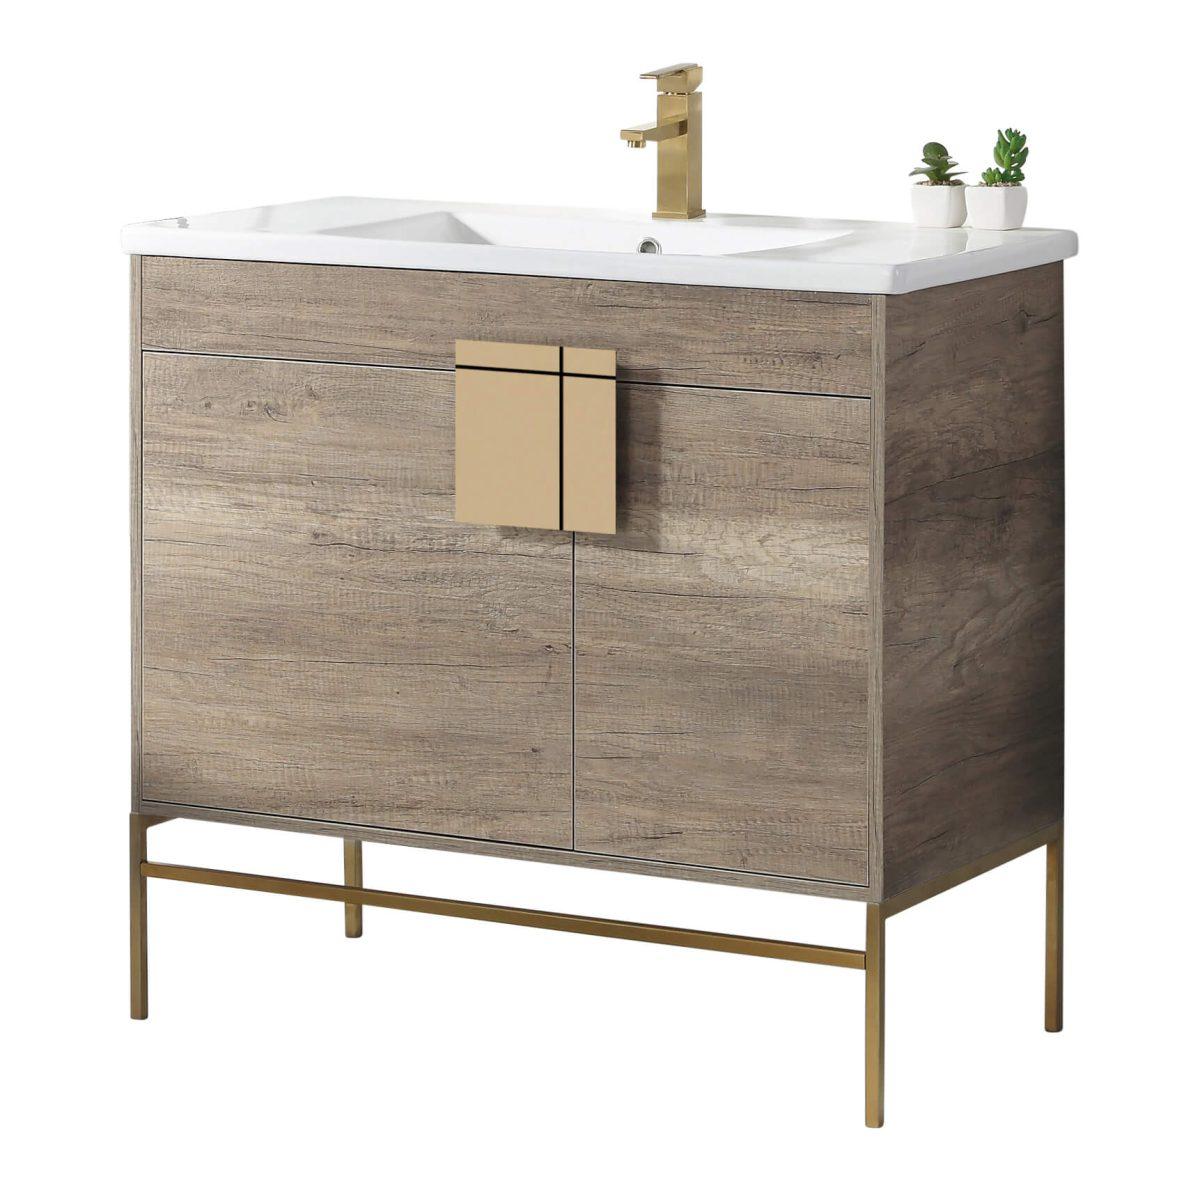 "Shawbridge 36"" Modern Bathroom Vanity  Shadow Gray with Satin Brass Hardware"